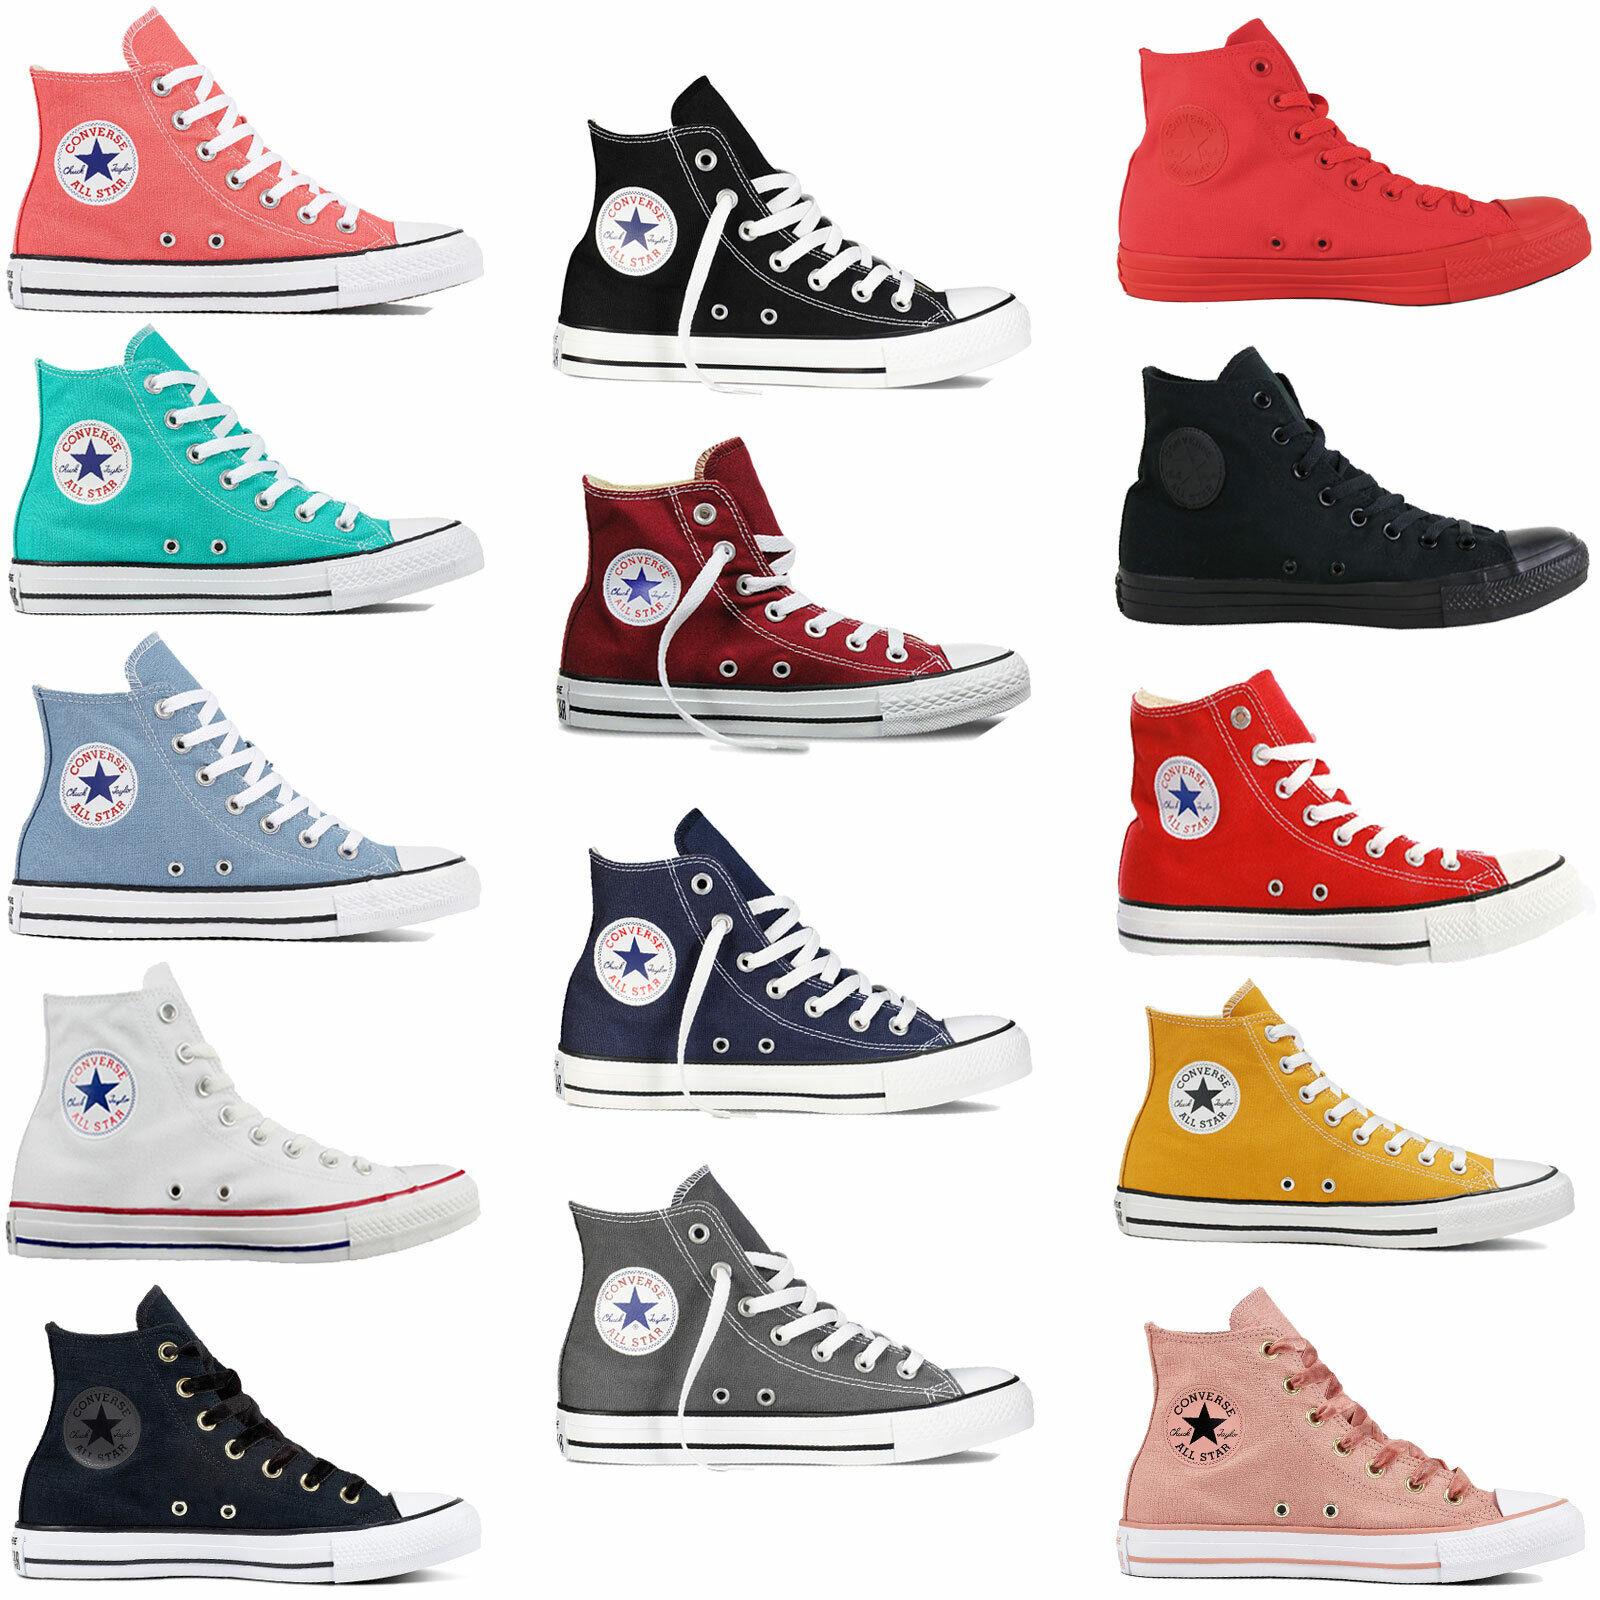 Converse Chuck Taylor All Star Hi Damen Sneaker Chucks Turnschuhe Hi Top Schuhe